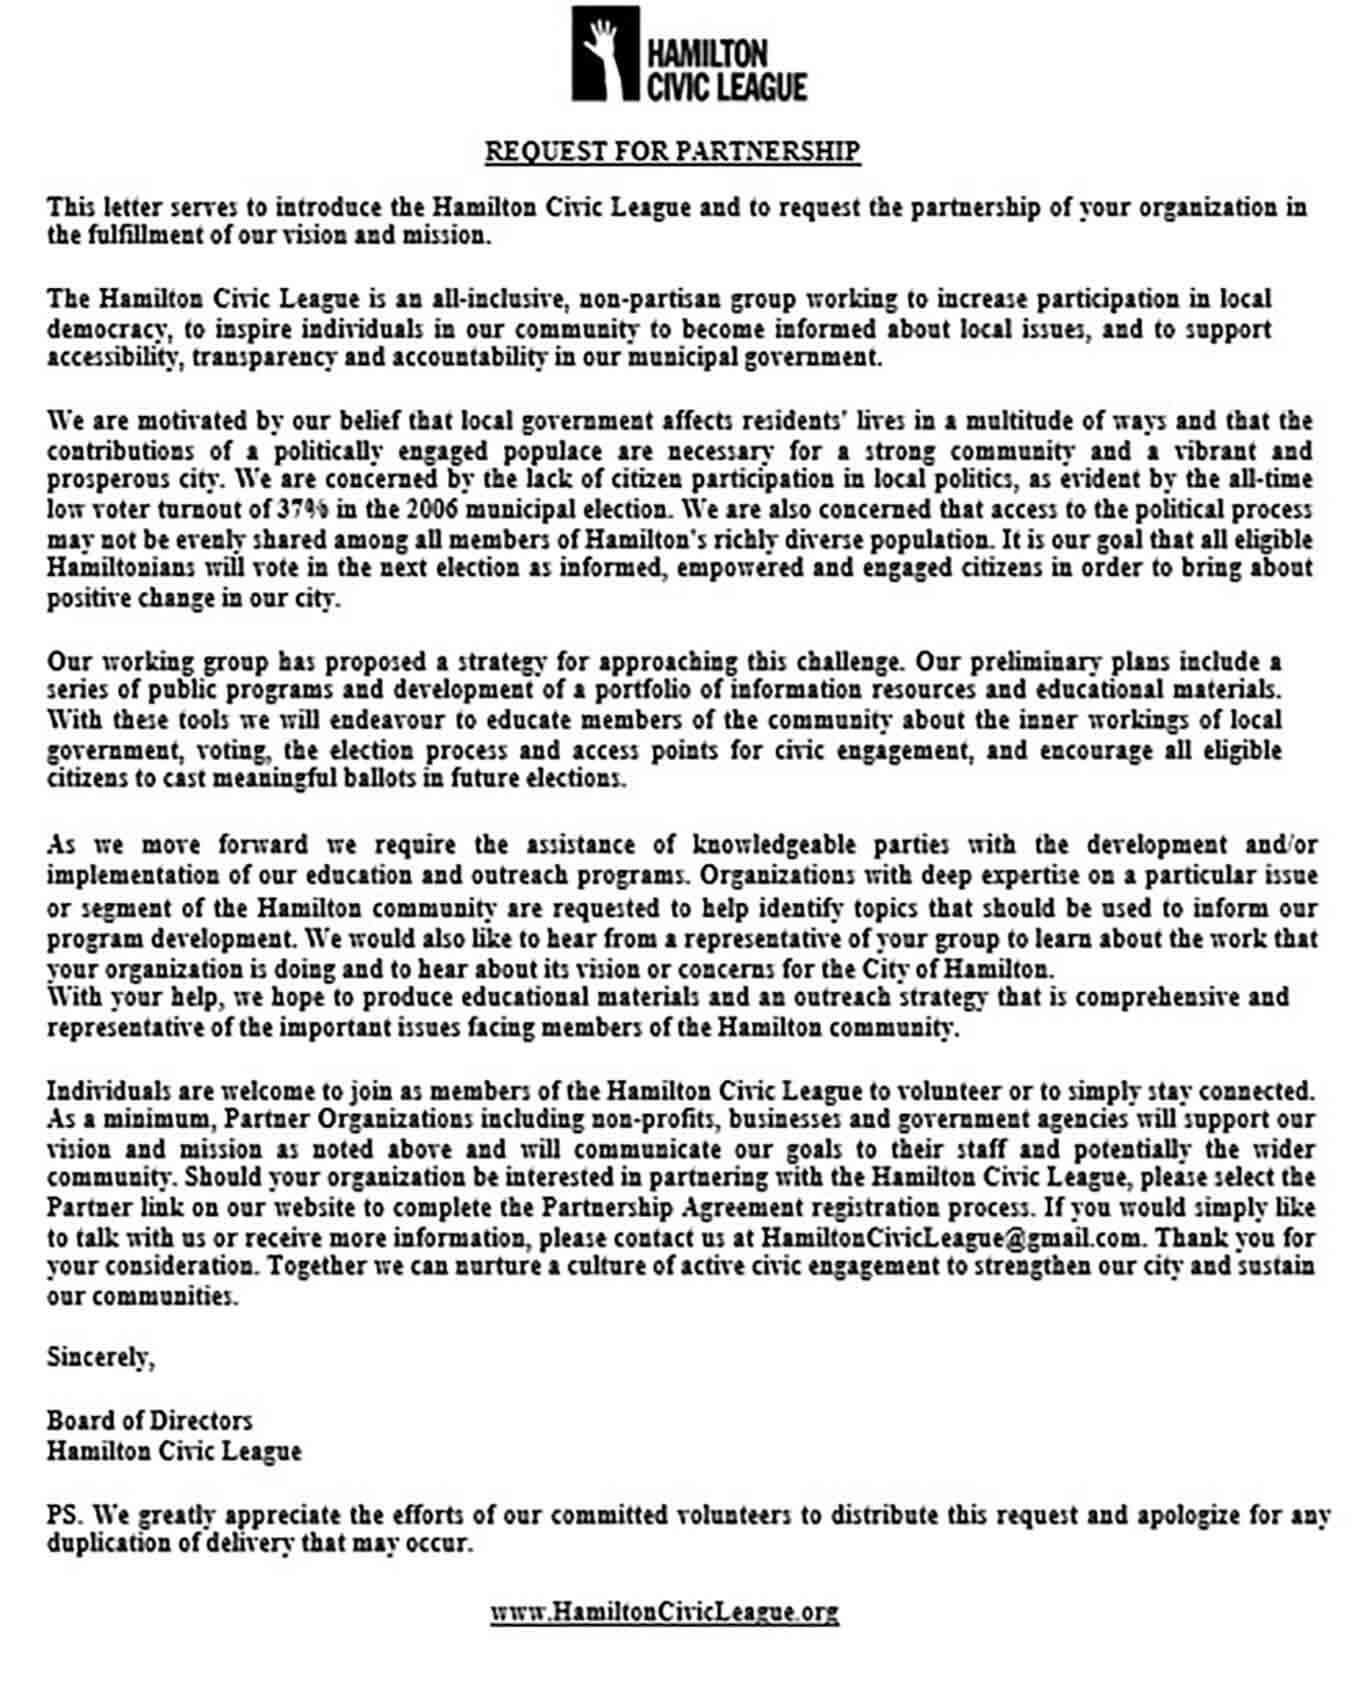 Partnership Proposal Request Letter